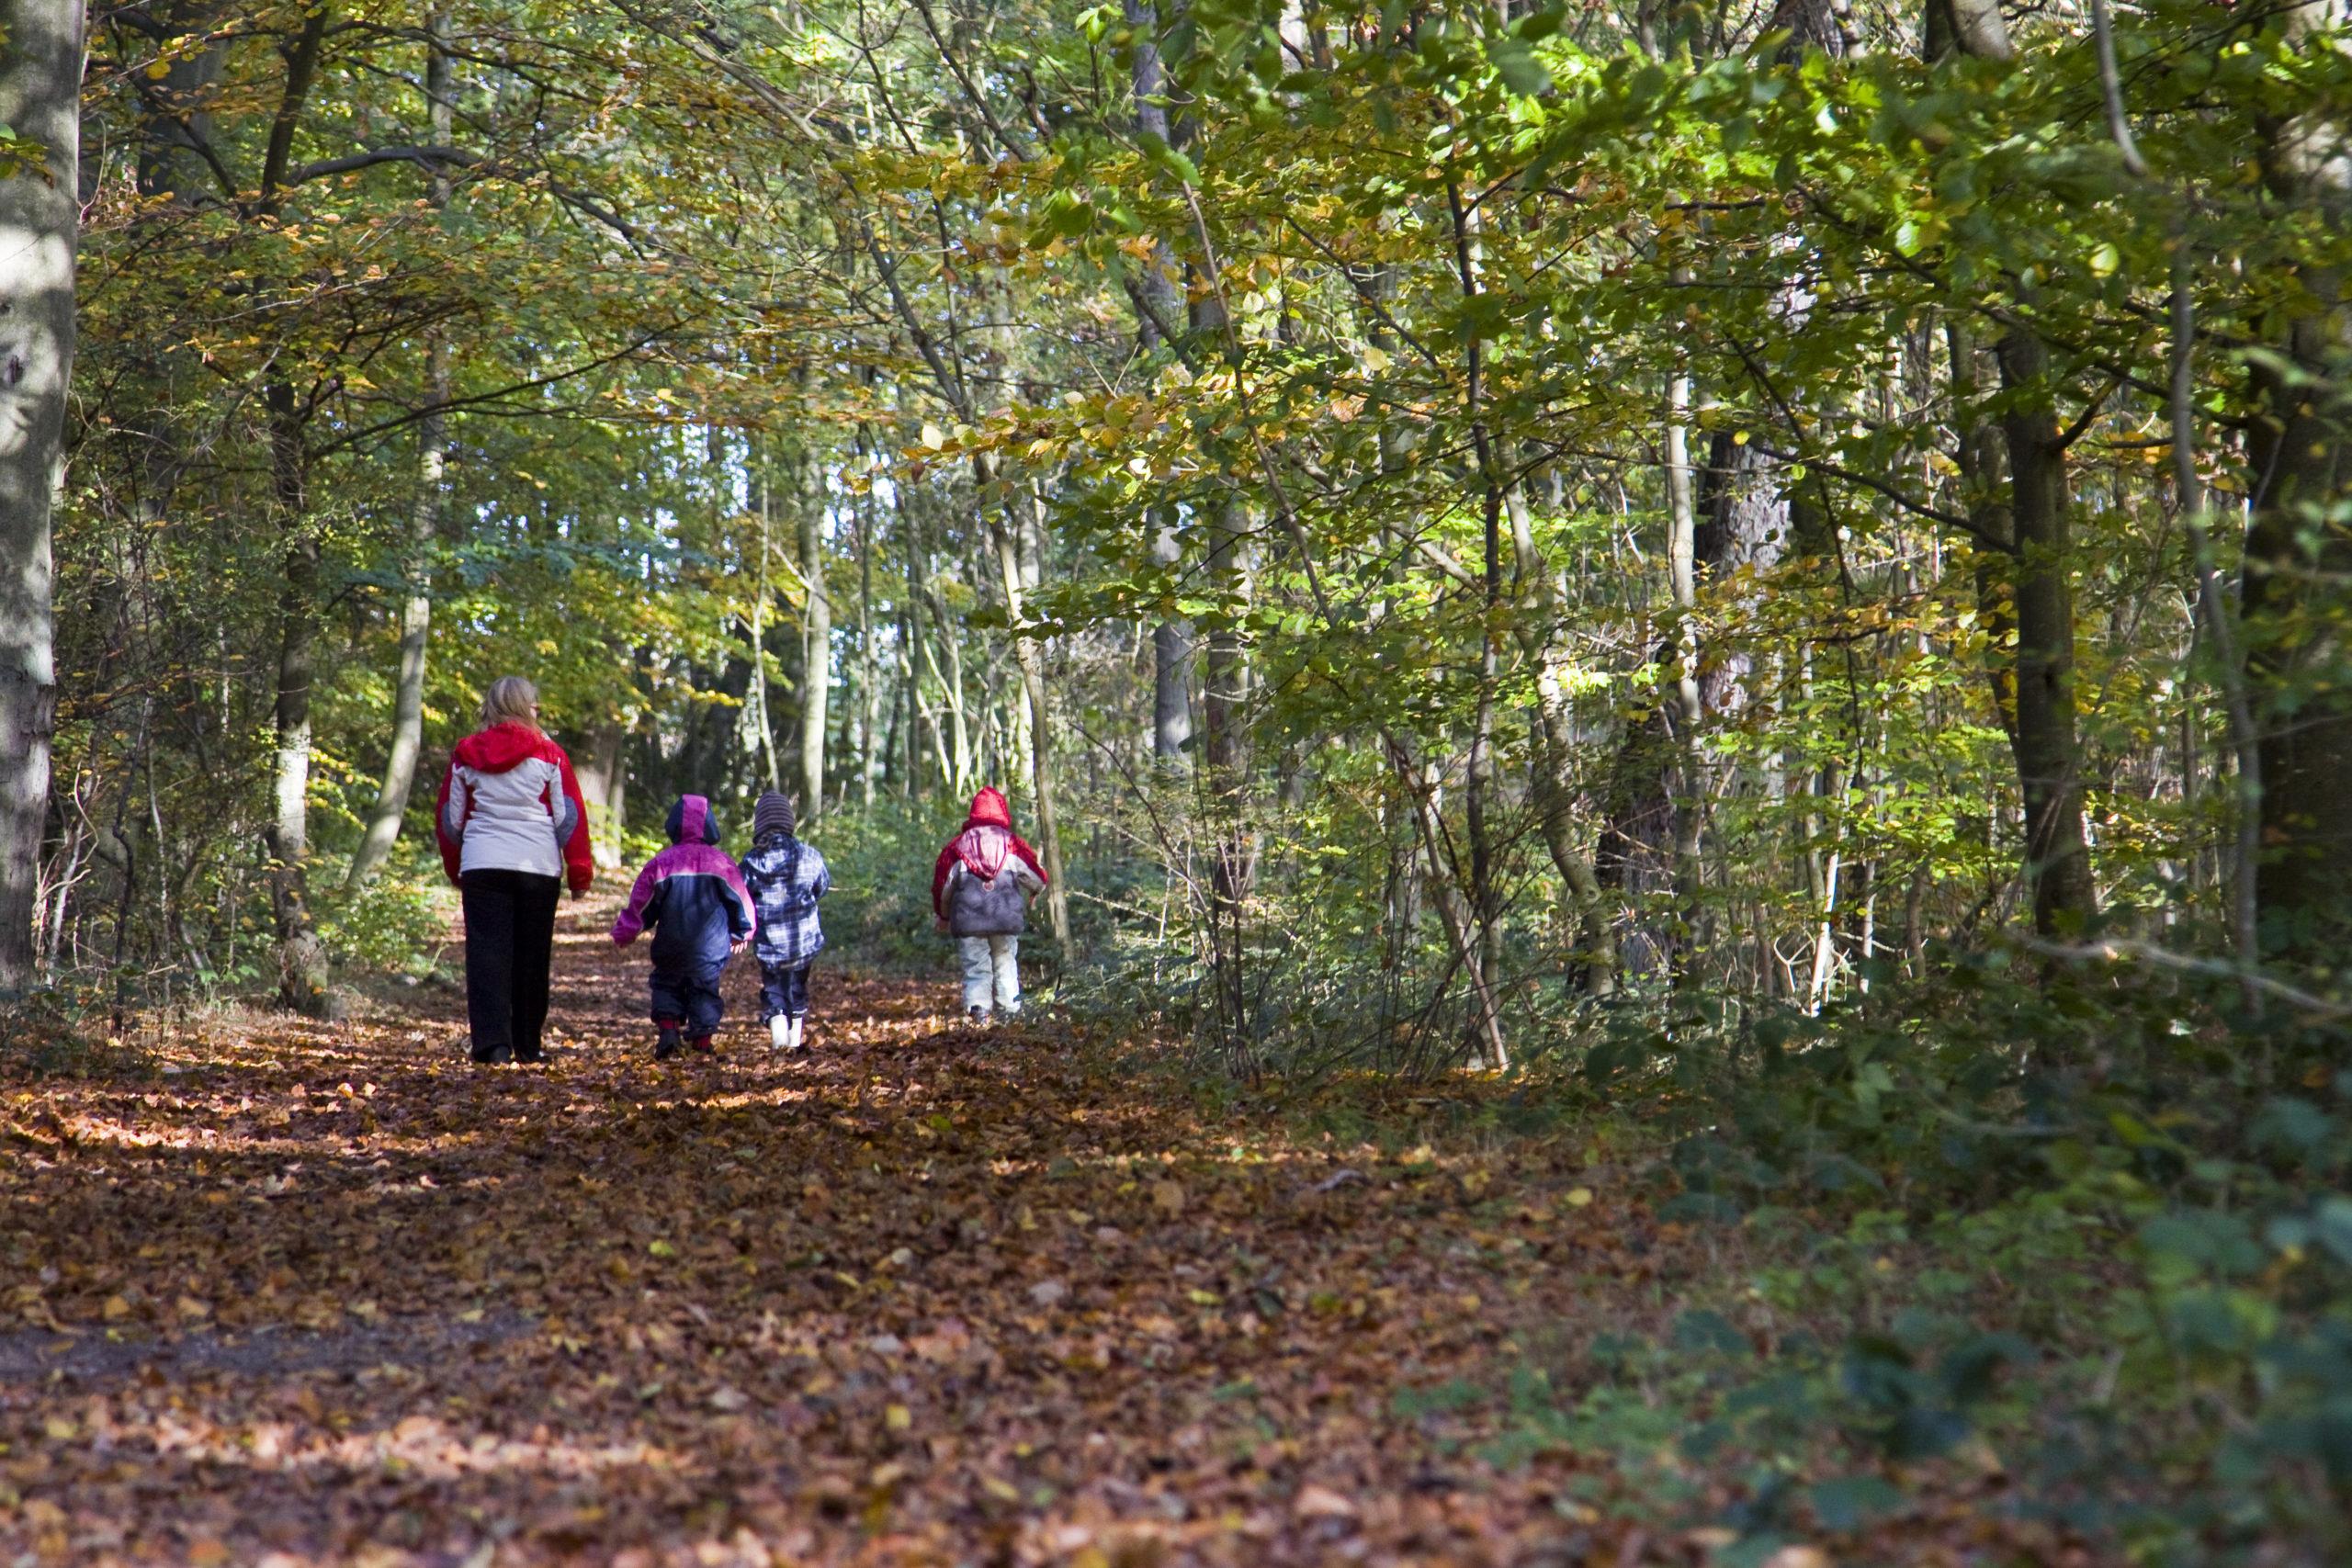 Children in a forest